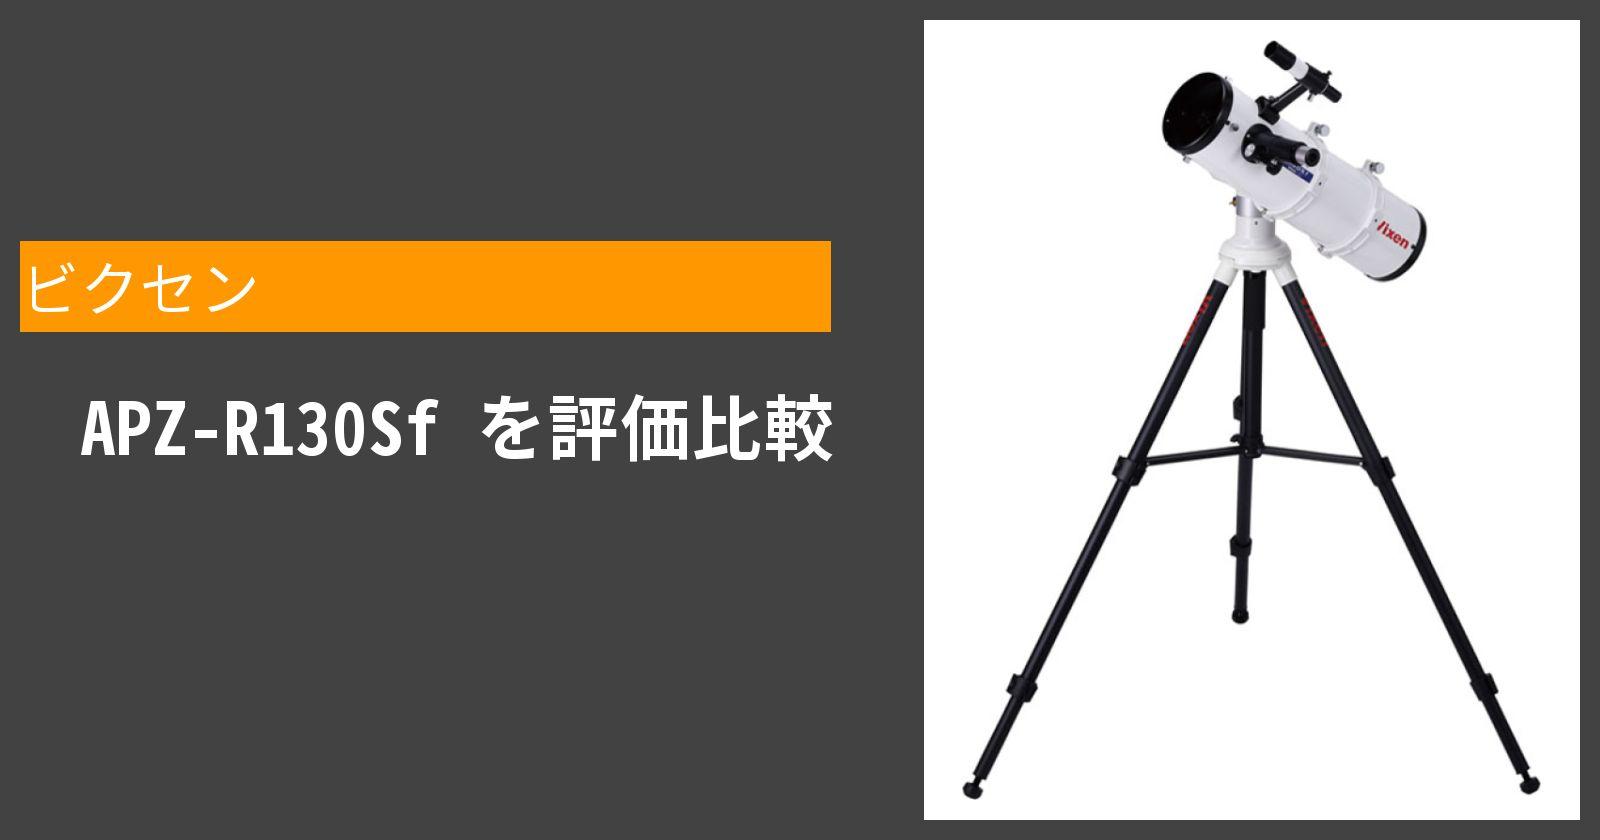 APZ-R130Sfを徹底評価